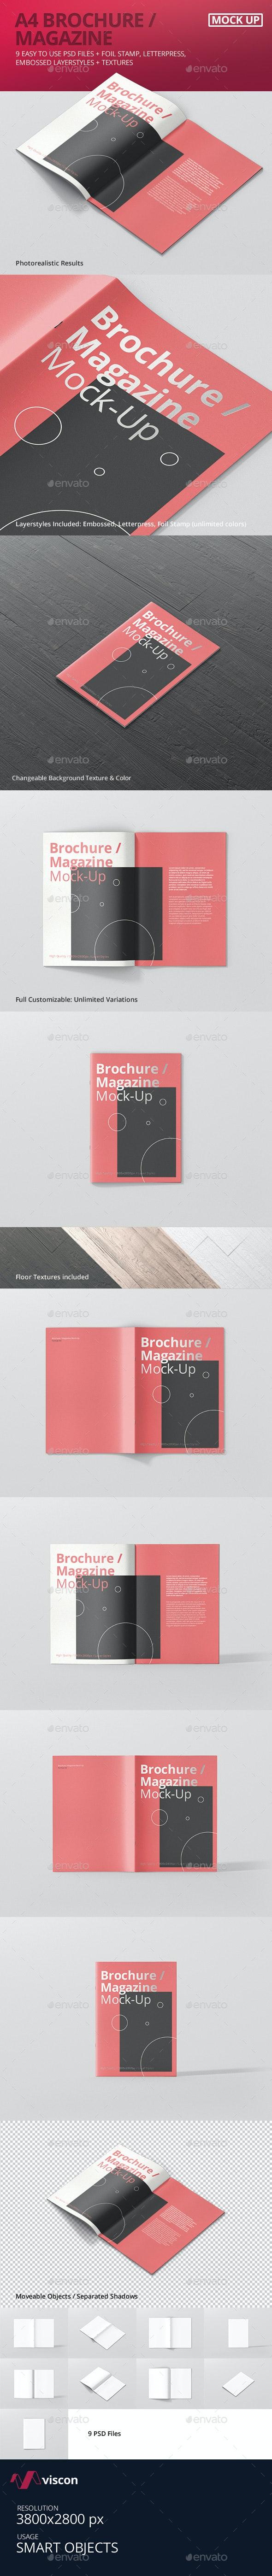 A4 Brochure / Magazine Mock-Up - Magazines Print